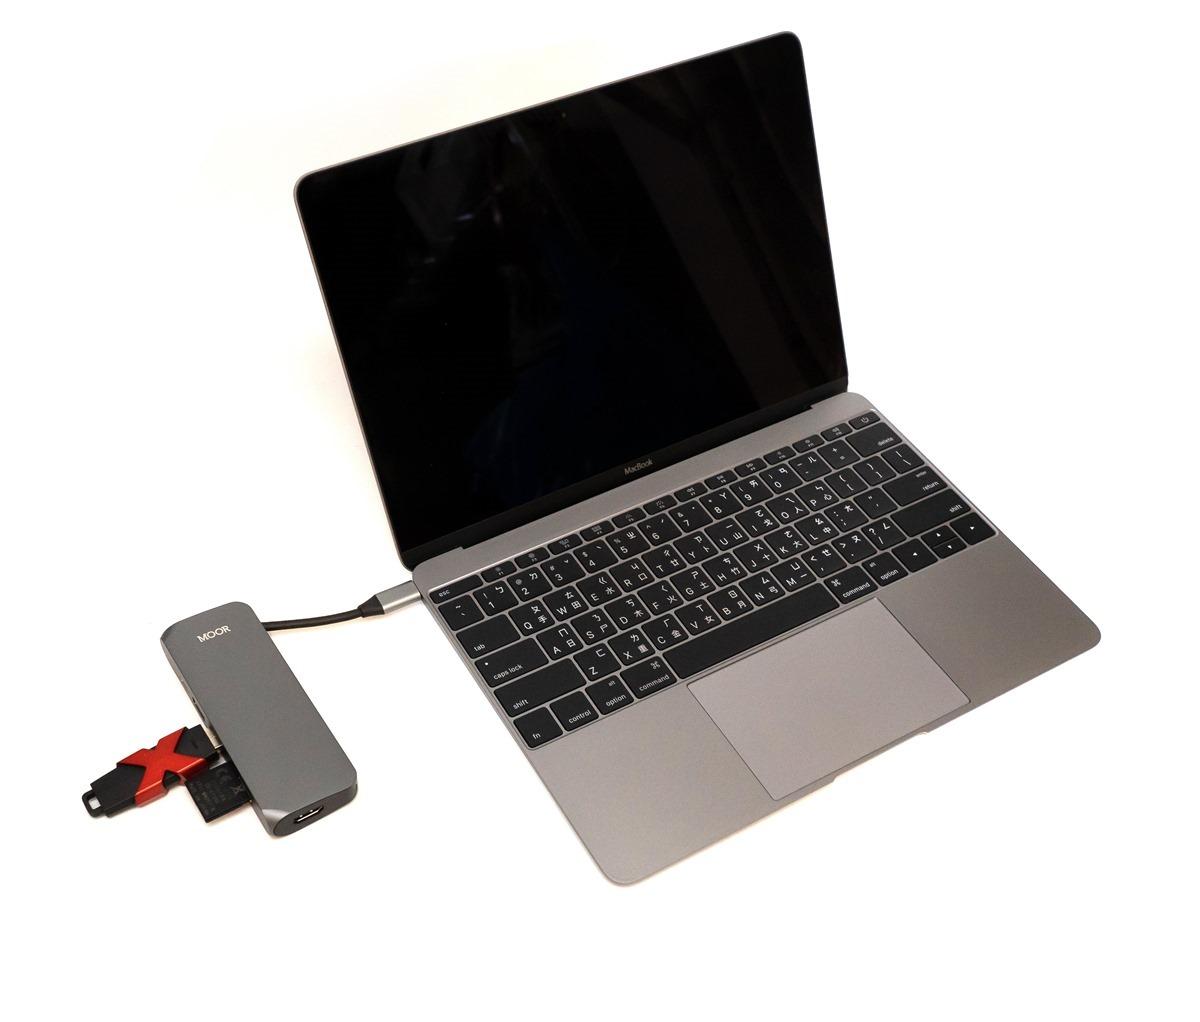 Type-C 多功能充電傳輸集線器 MOOR 分享 (HDMI/讀卡機/USB/可收納線材) @3C 達人廖阿輝